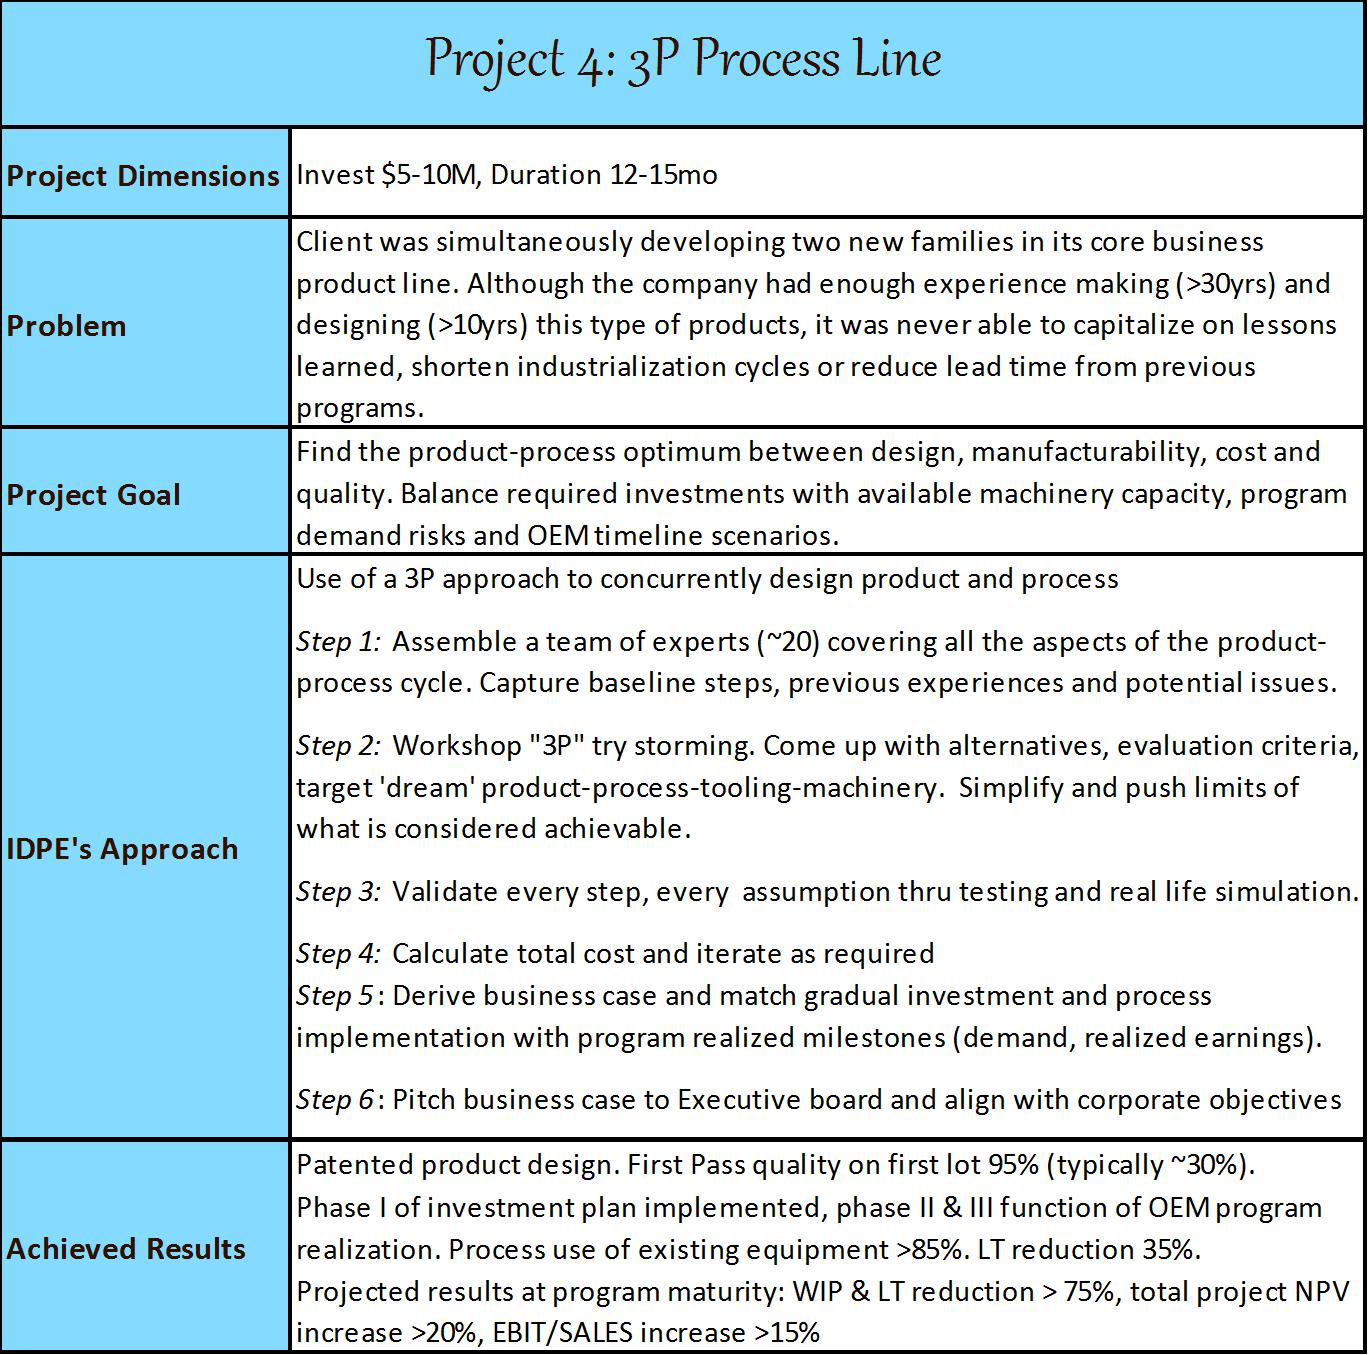 Project4-3P_ProcessLine